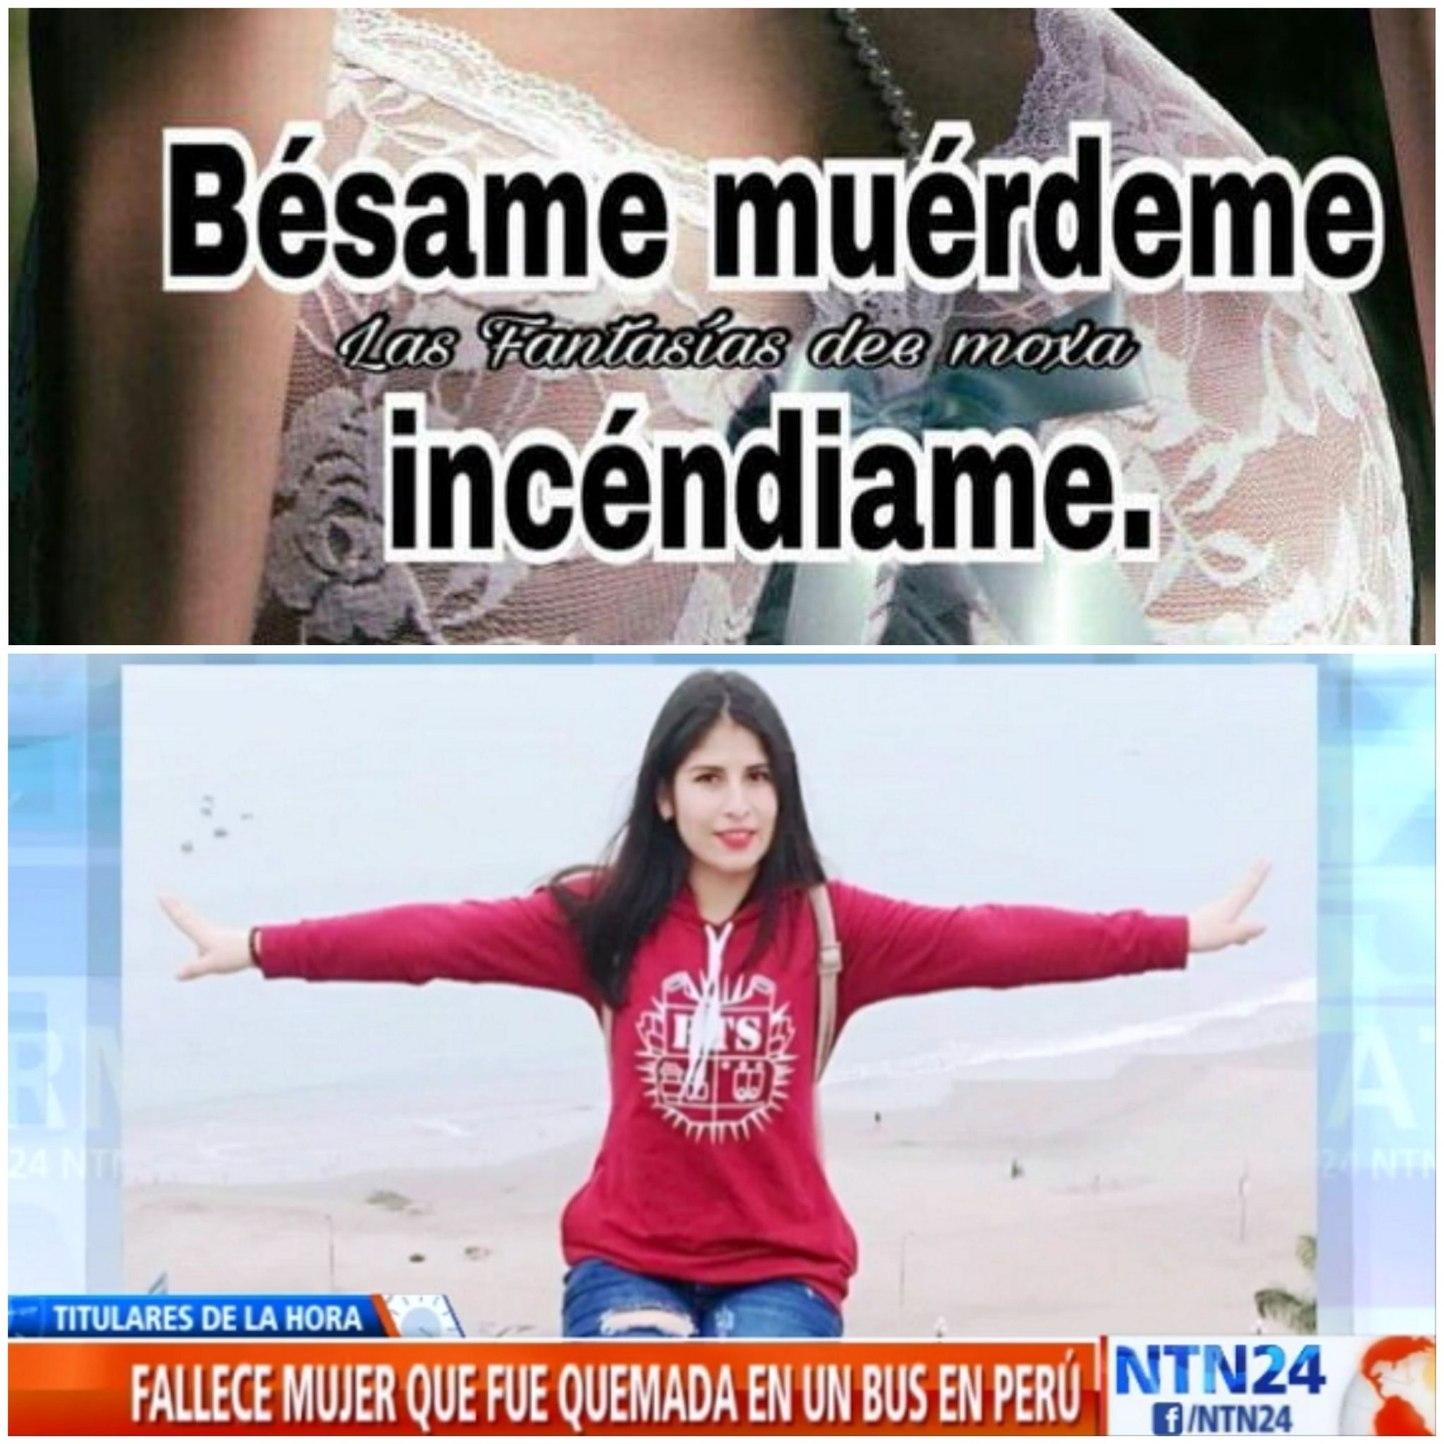 Alto_Humor_Negro.jpg xdxd - meme